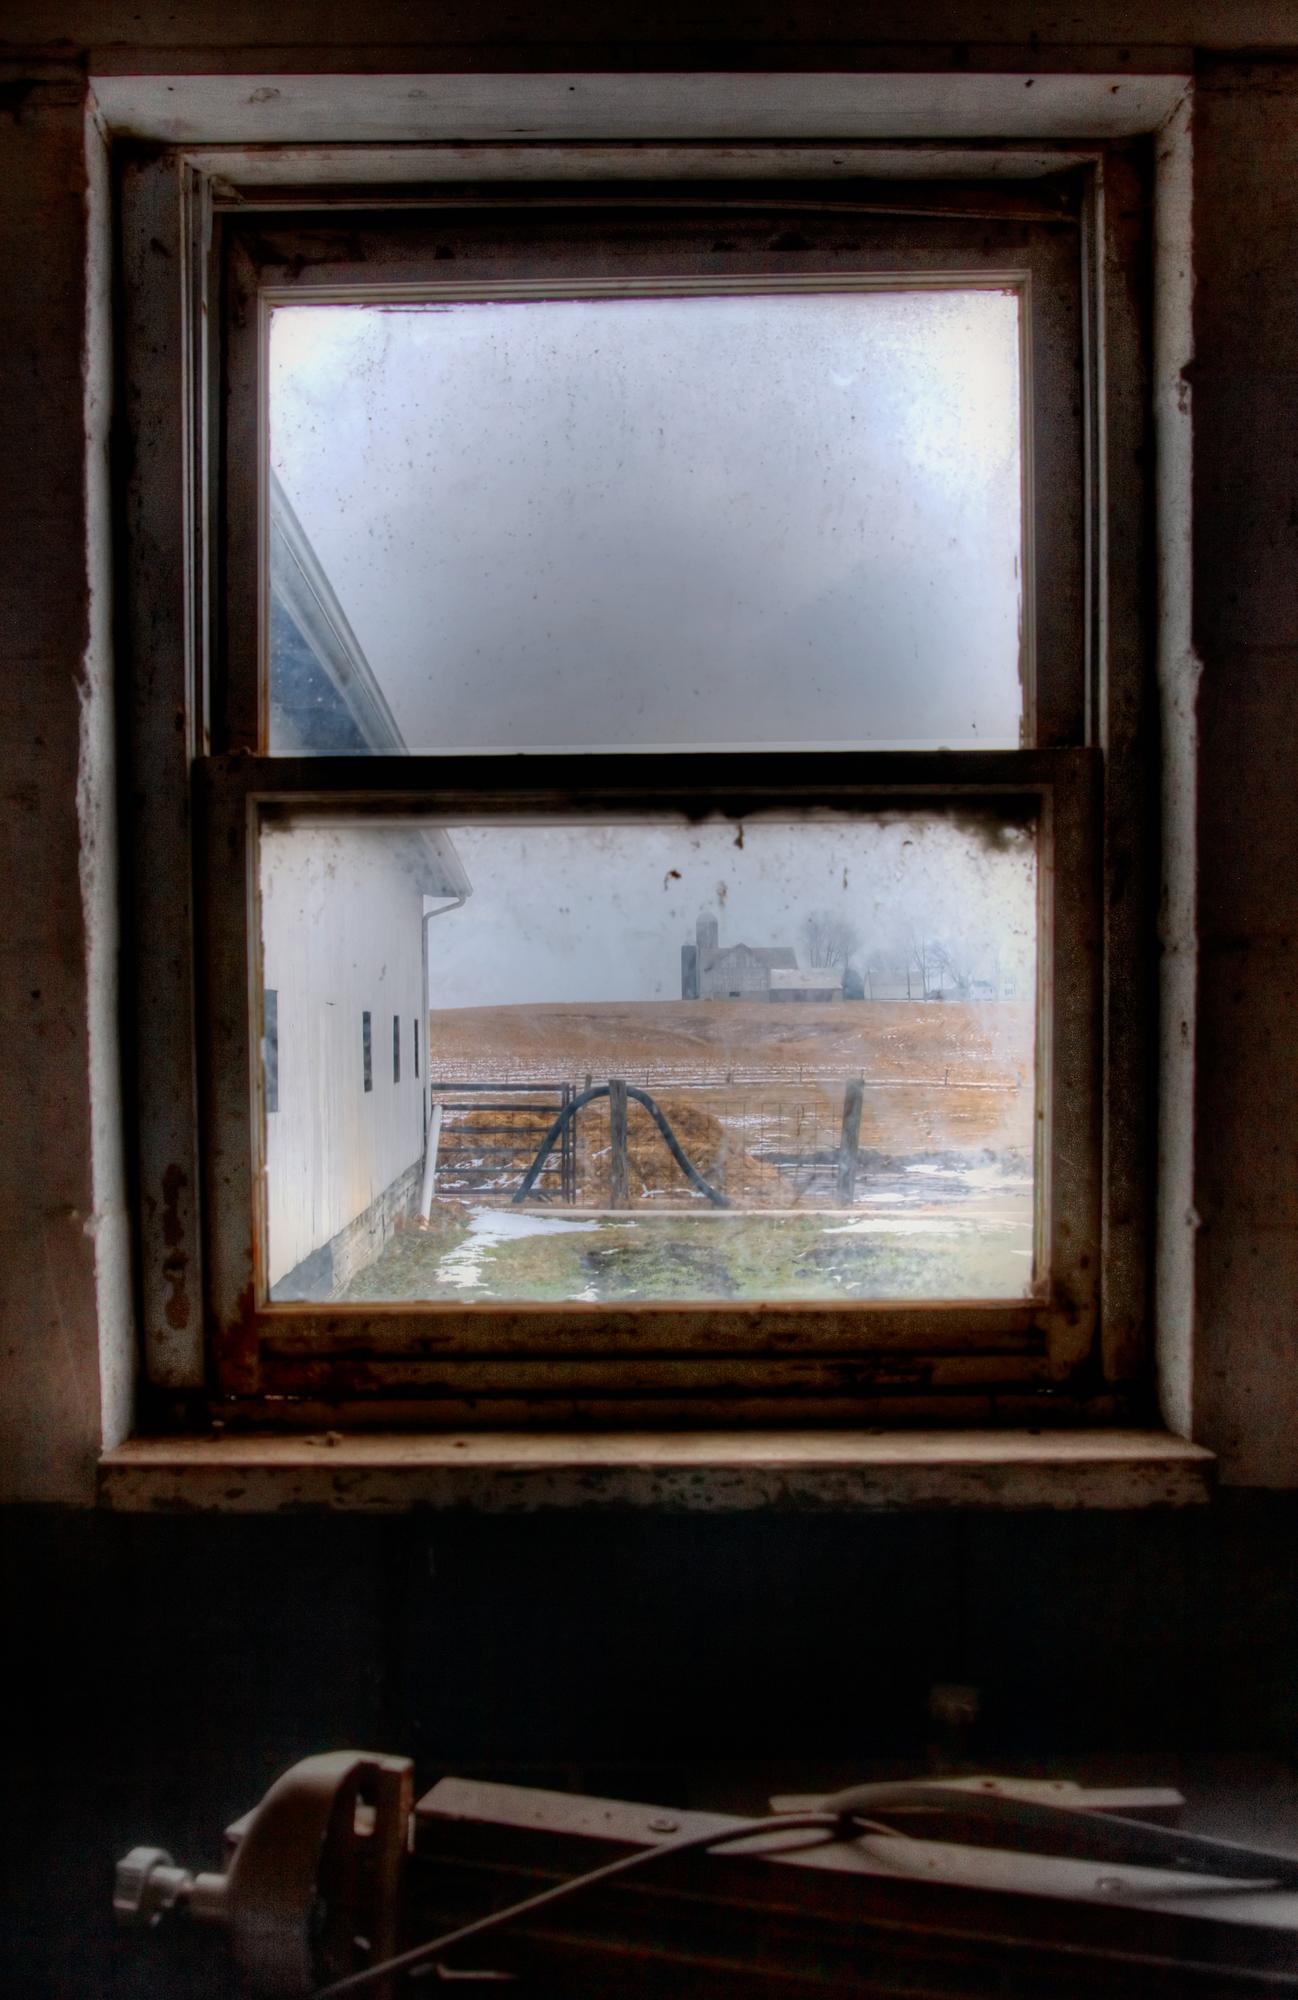 Blick durchs Fenster, Breezy Hill Farm - (c) Sofie Dittmann